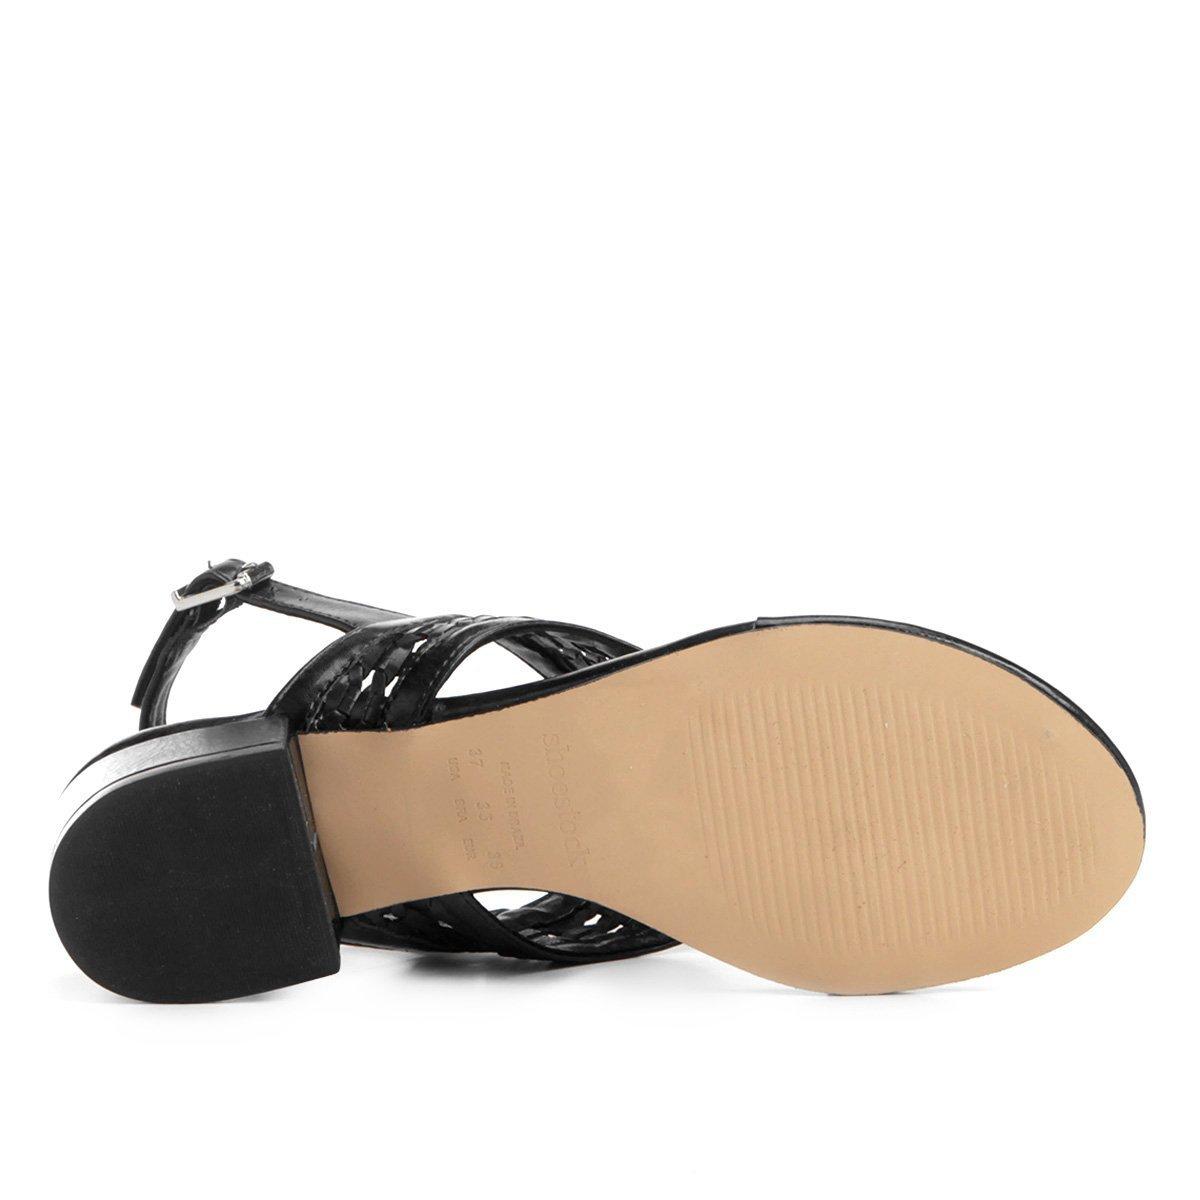 Salto Sandália Sandália Preto Shoestock Grosso Shoestock Grosso Tressê Tressê Feminina Preto Feminina Sandália Salto qFnwCzHH